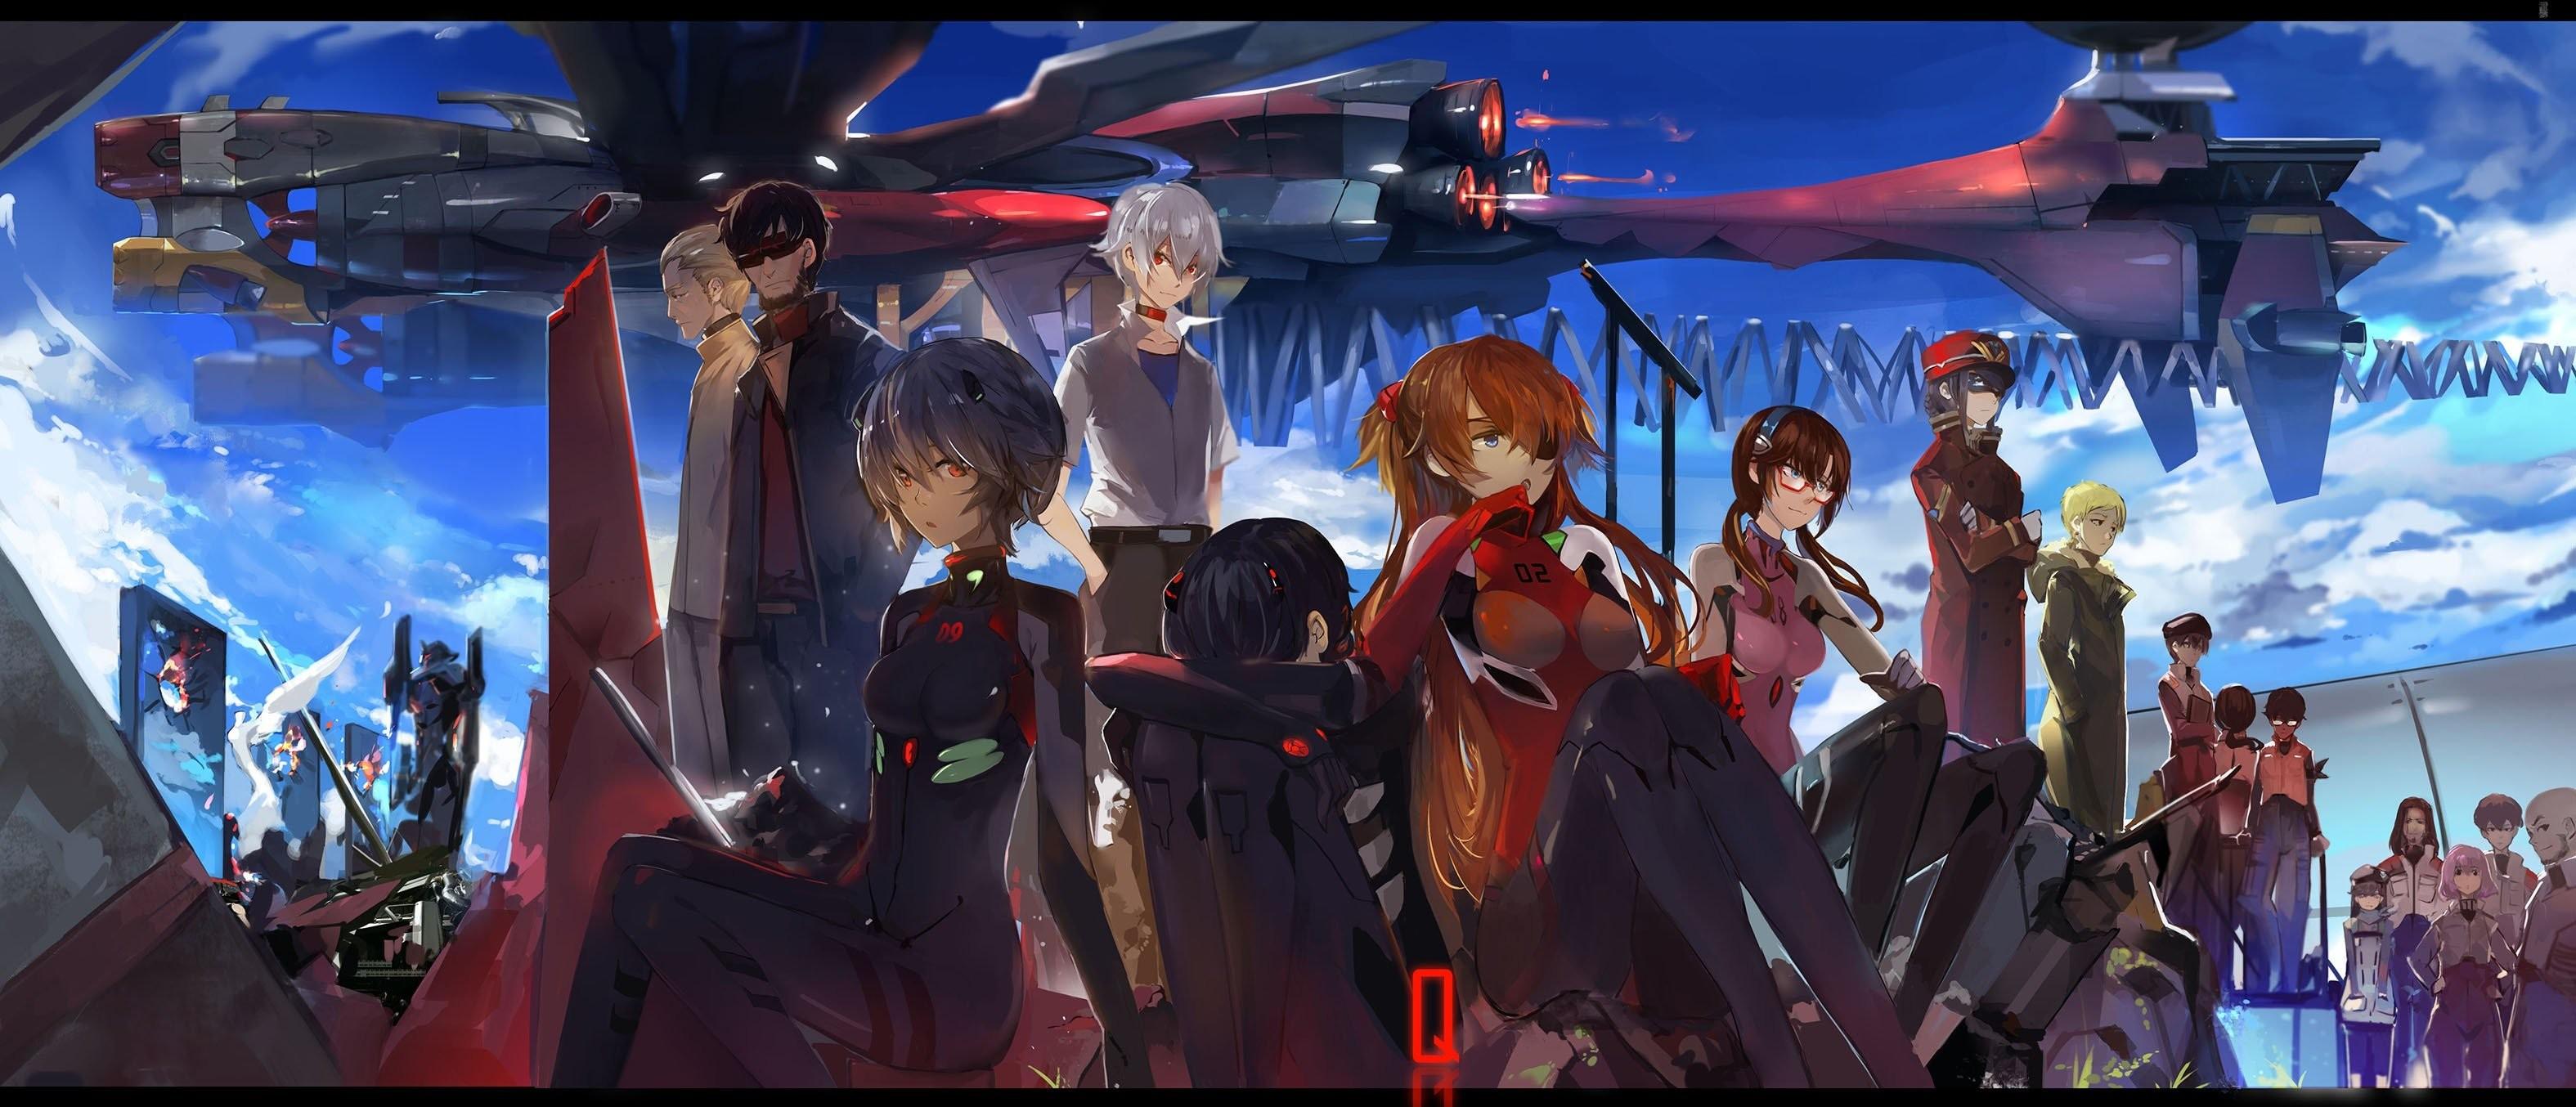 Neon Genesis Evangelion Wallpaper HD (71+ images)